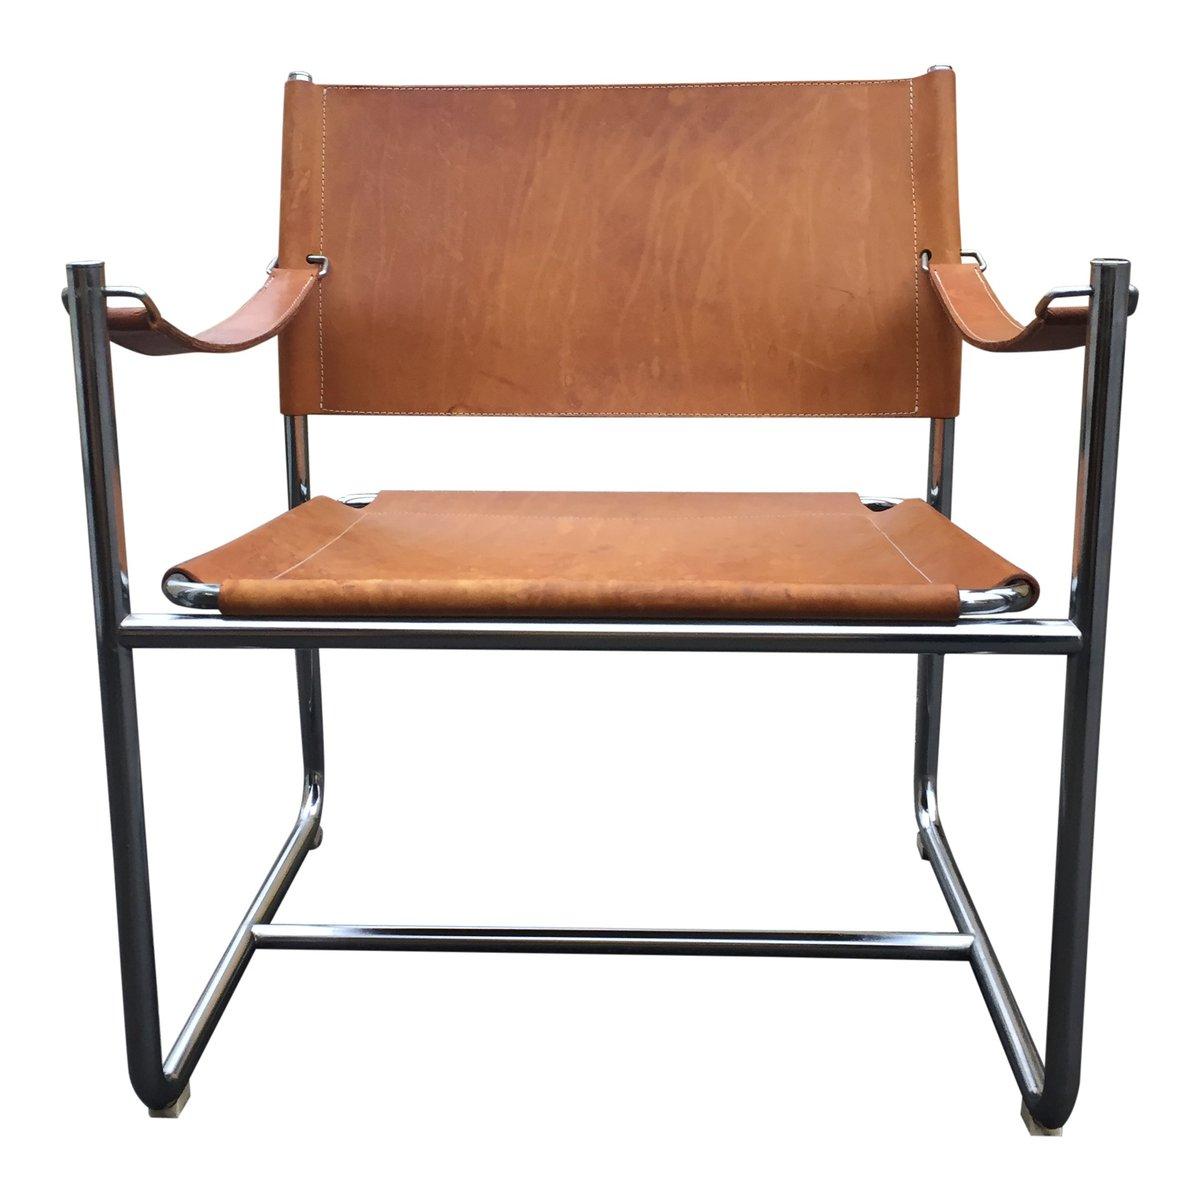 Leder safari stuhl von karin mobring f r ikea bei pamono for Design stuhl ikea